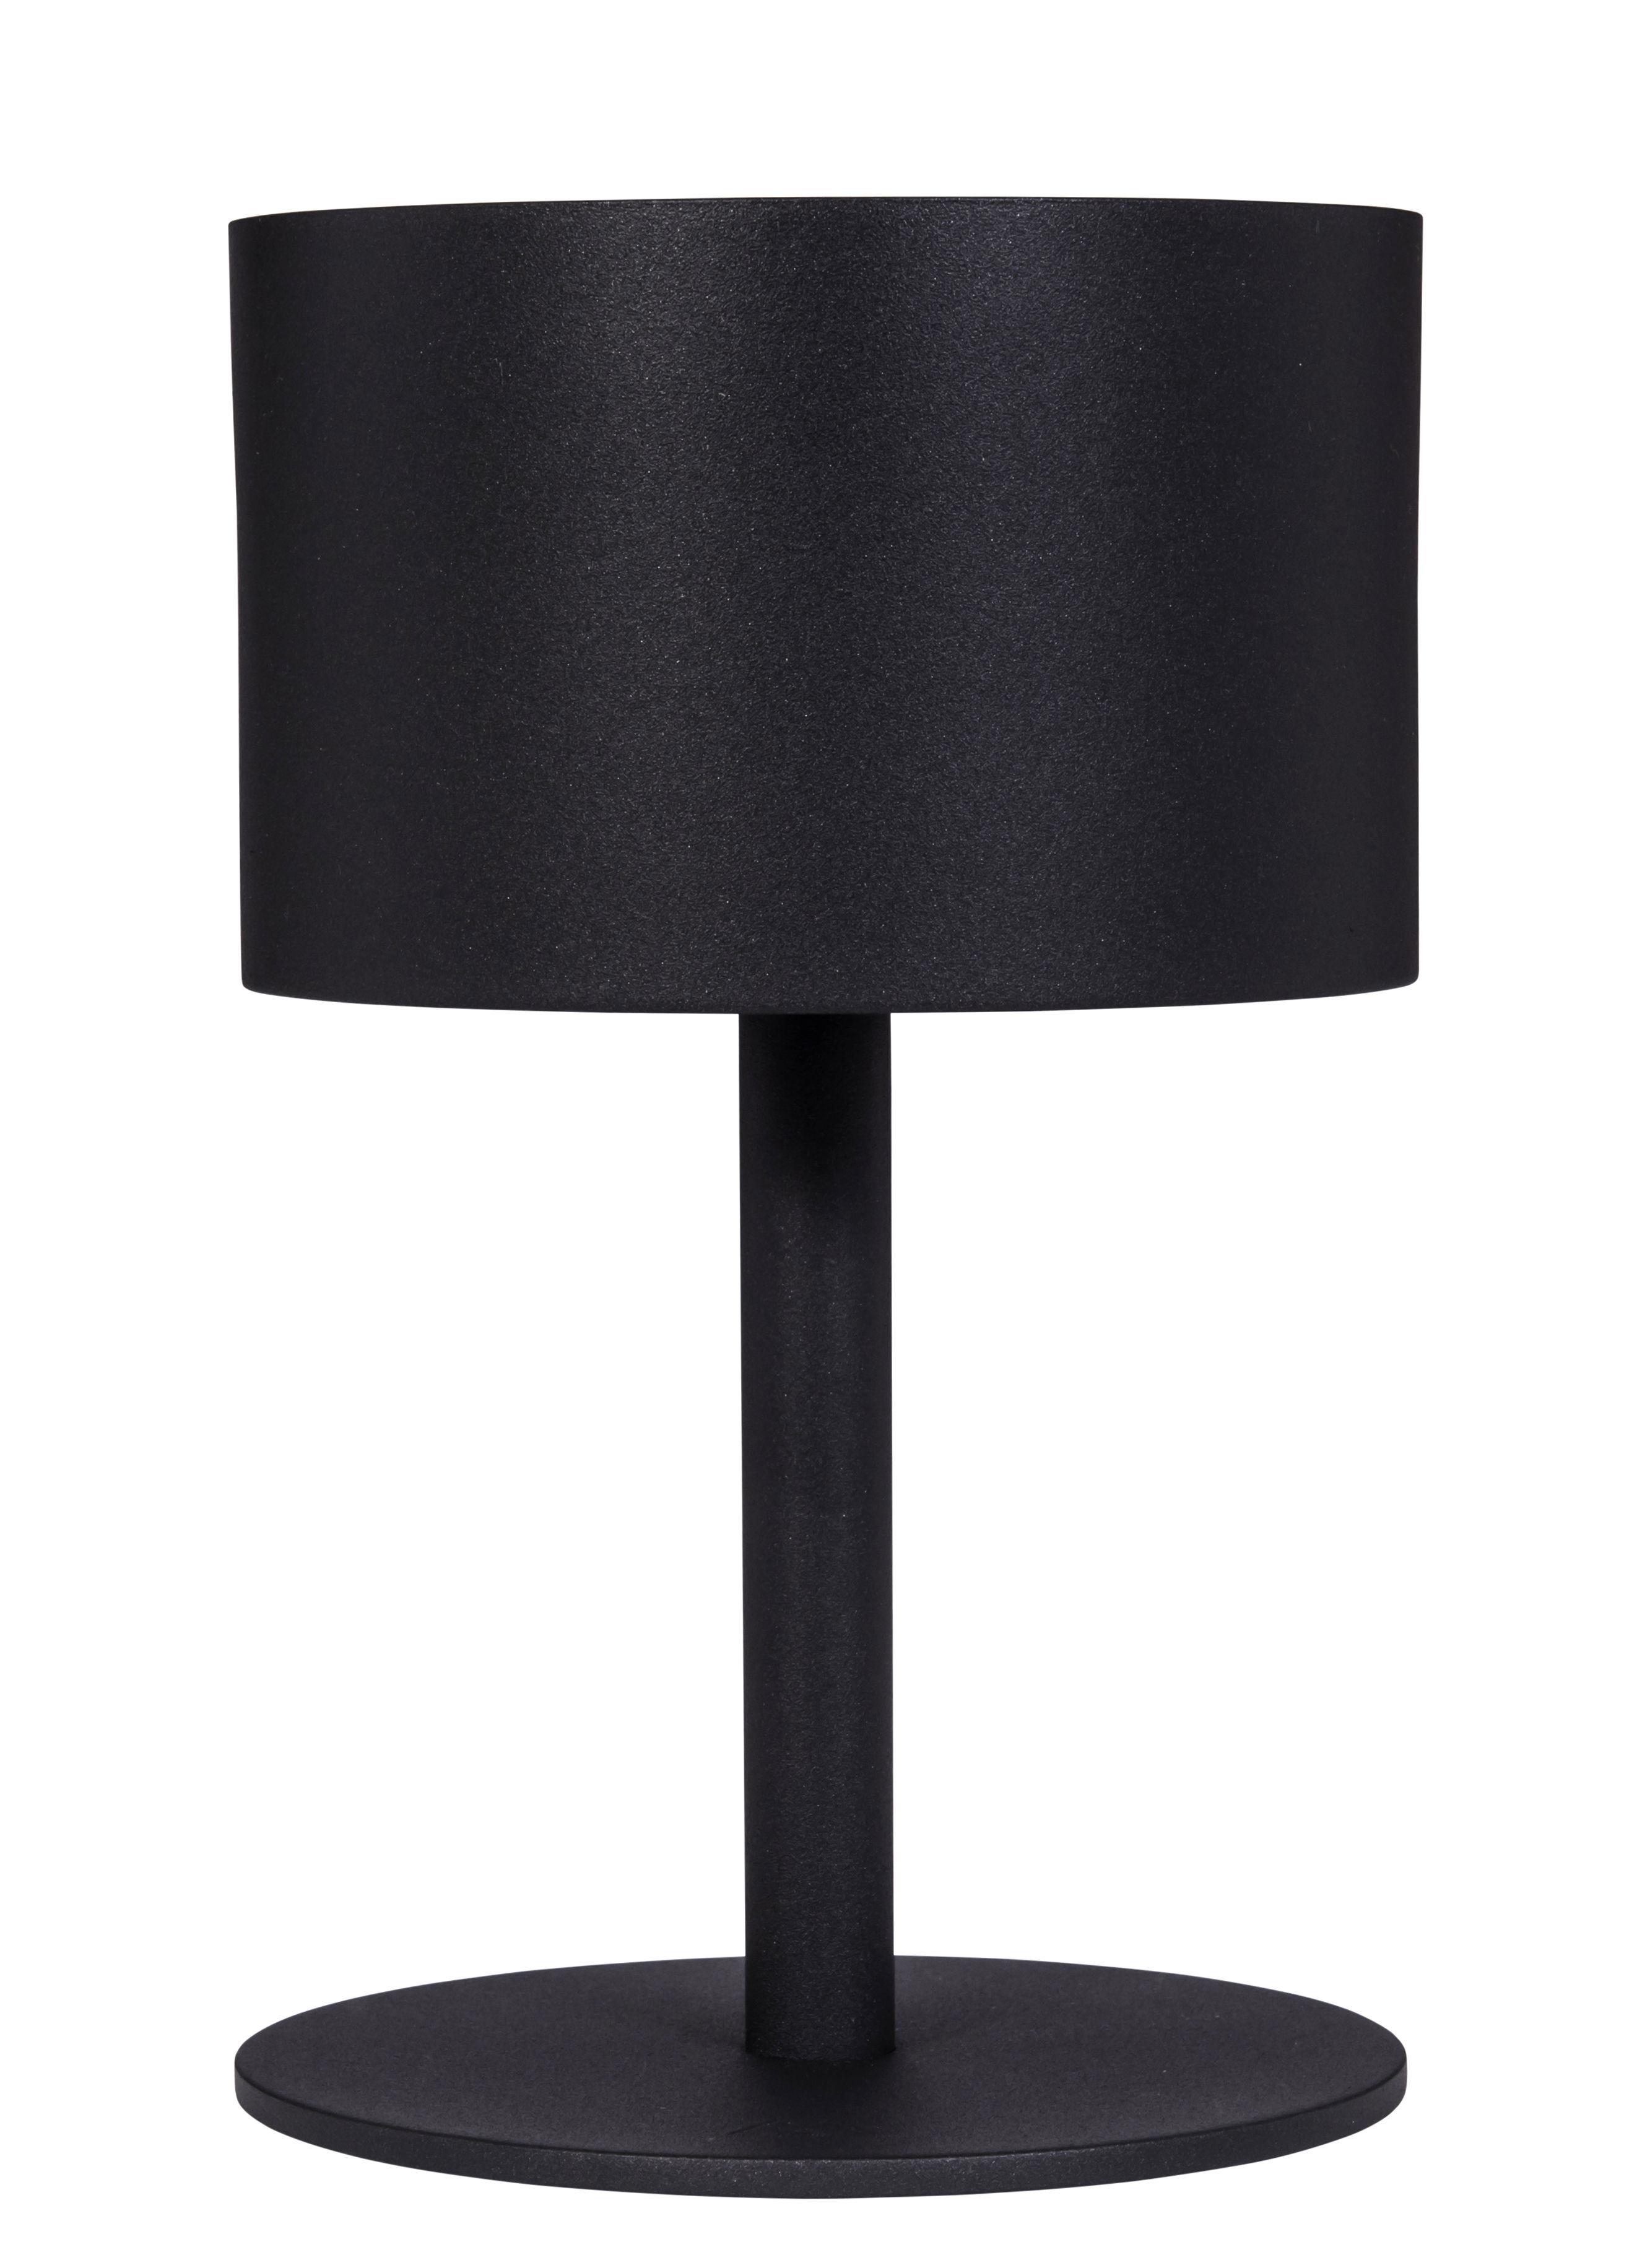 la lampe pose 01 solar lamp charcoal by maiori. Black Bedroom Furniture Sets. Home Design Ideas